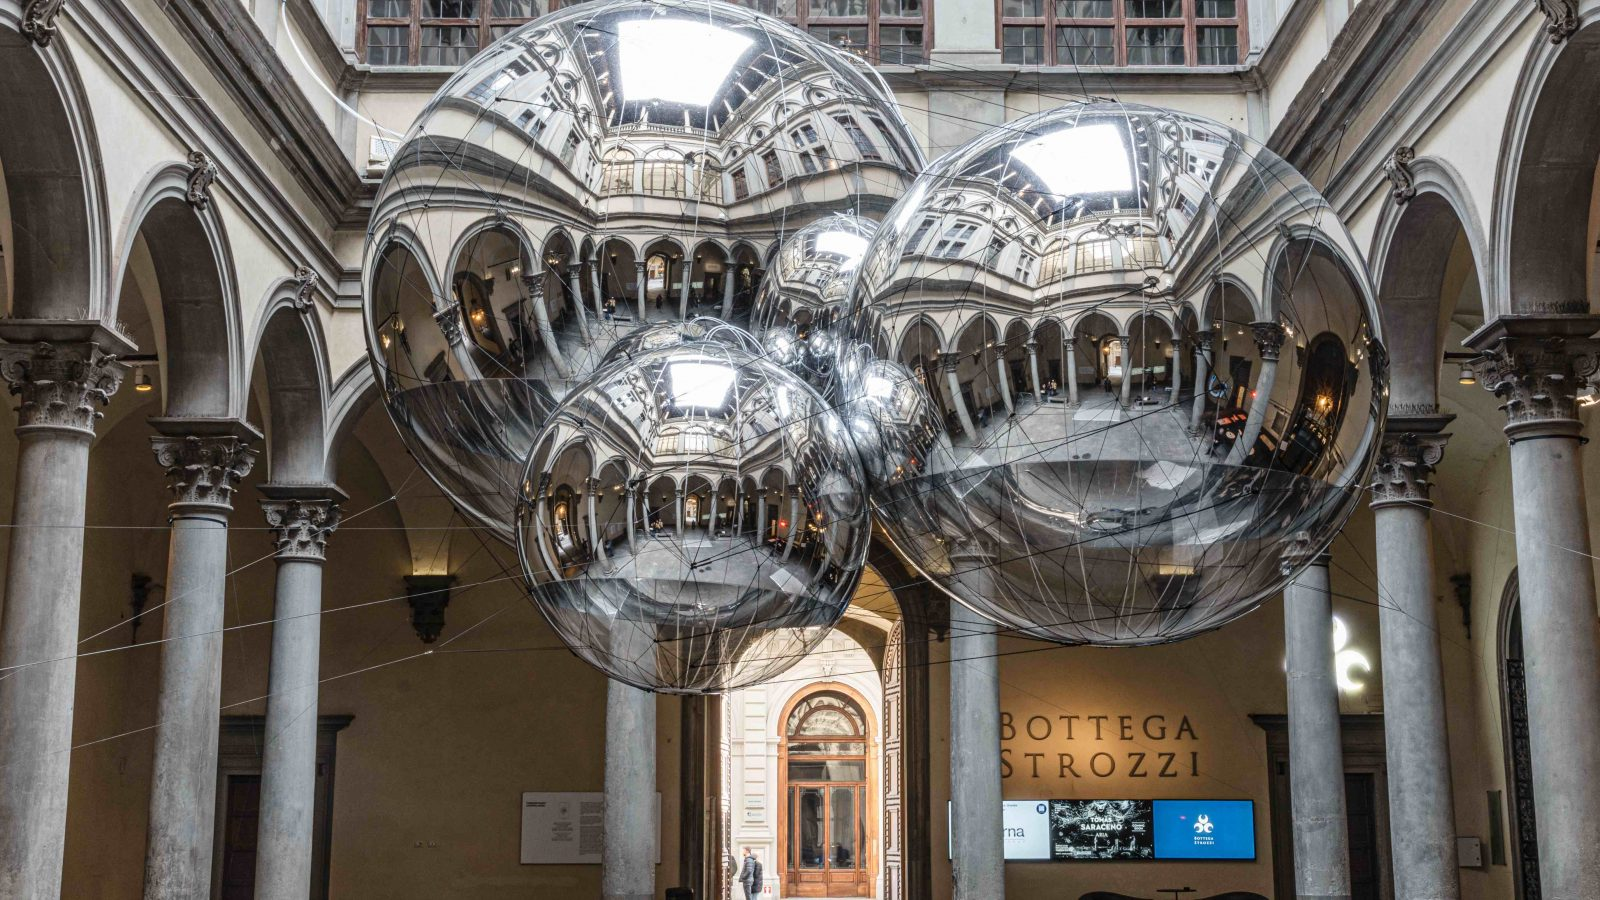 Palazzo Strozzi - Photography -® Ela Bialkowska, OKNO Studio, 4-DSC06983tif-OKNOstudio (1)